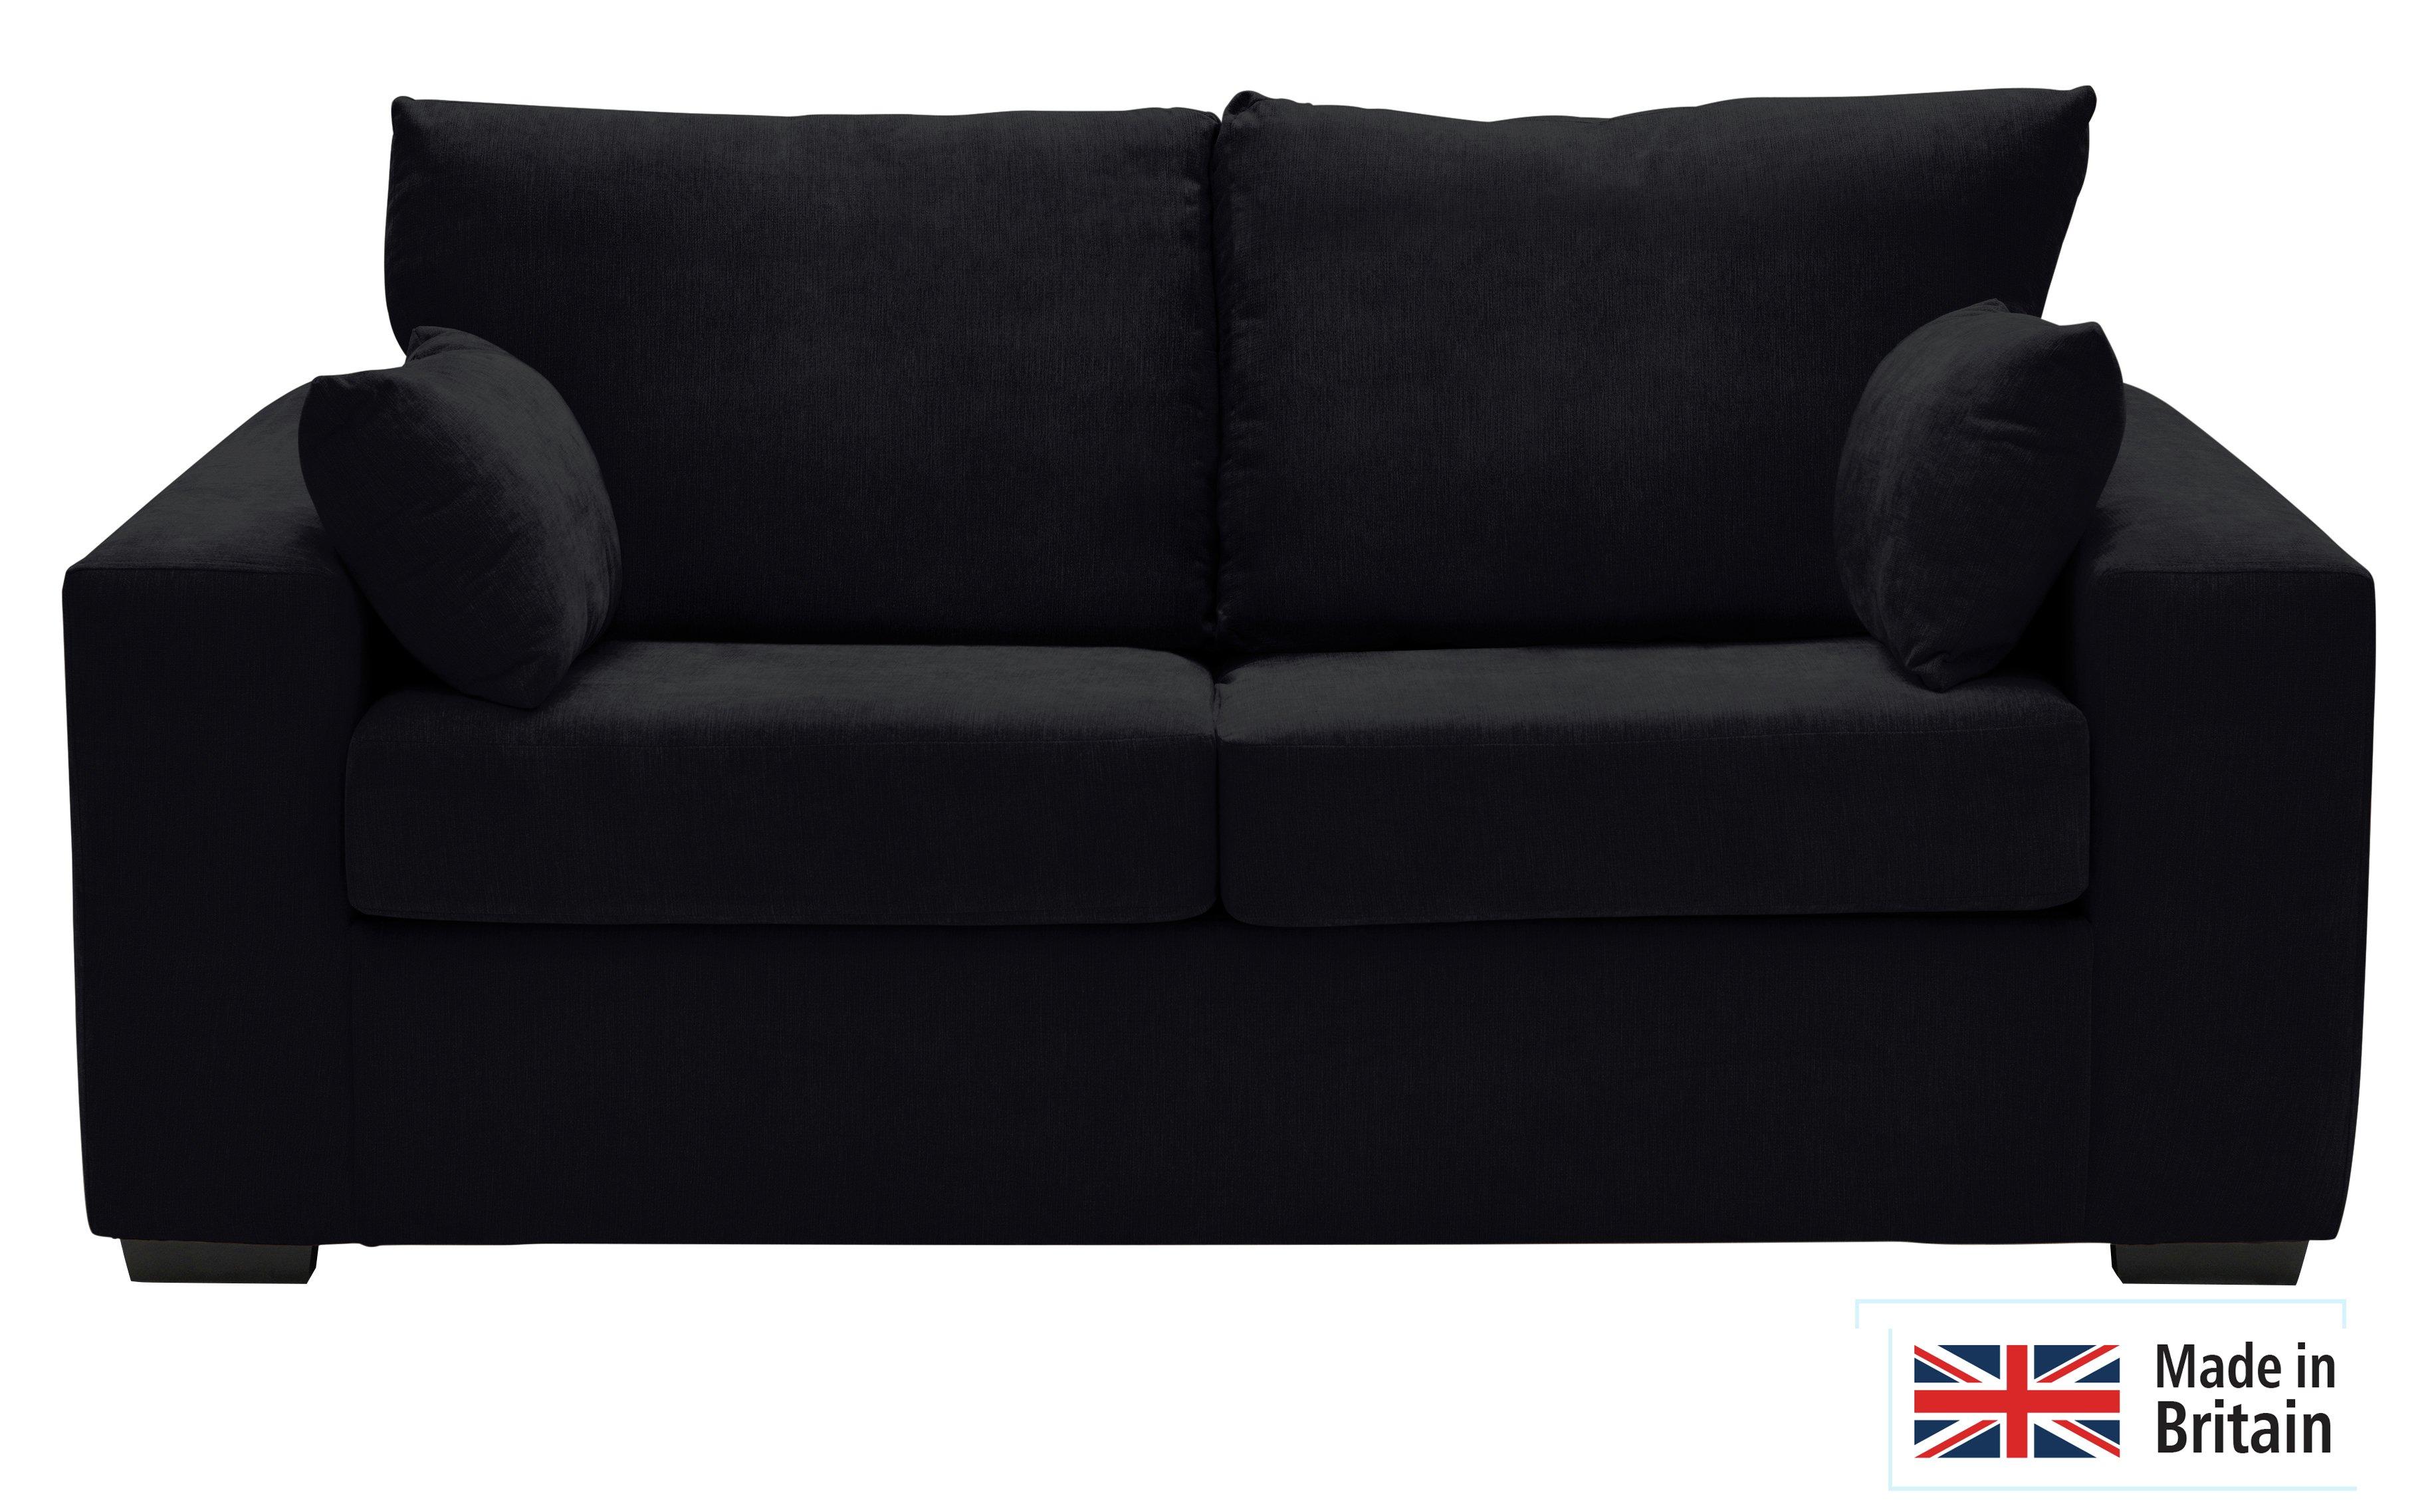 Argos Home Eton 2 Seater Fabric Sofa Bed - Black